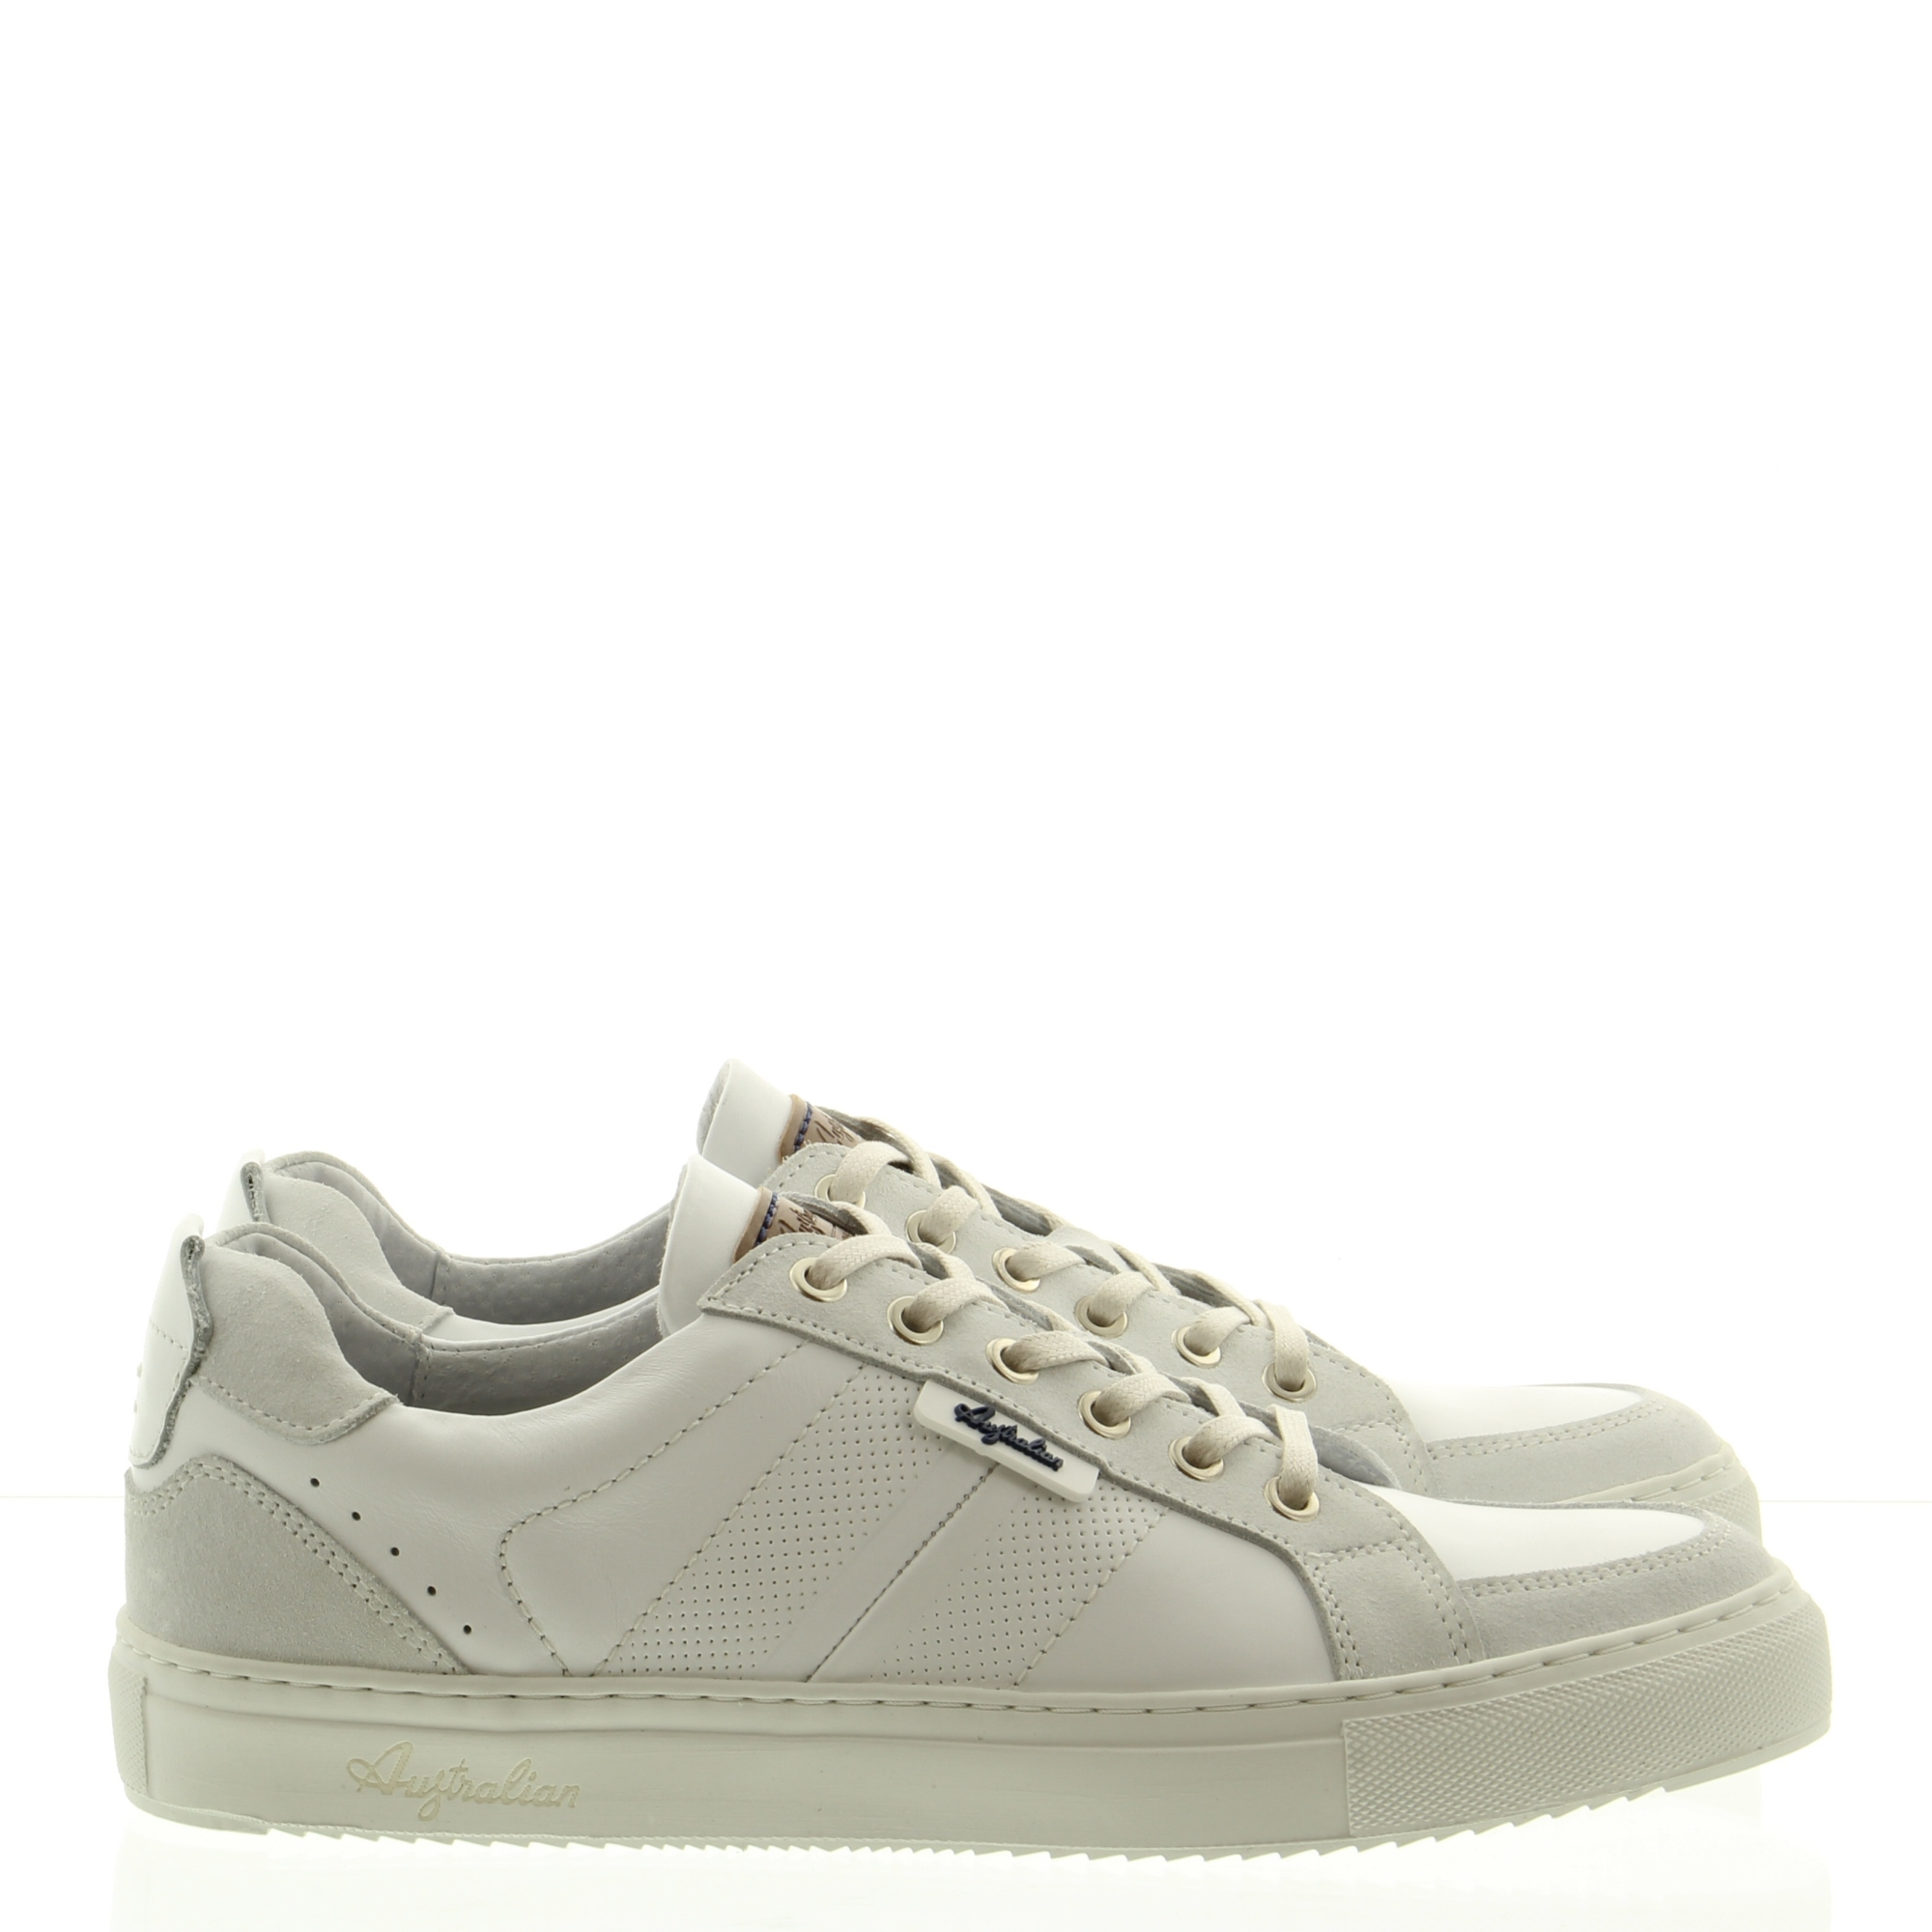 Australian Footwear Cardiff 15.1408.01 B00 White